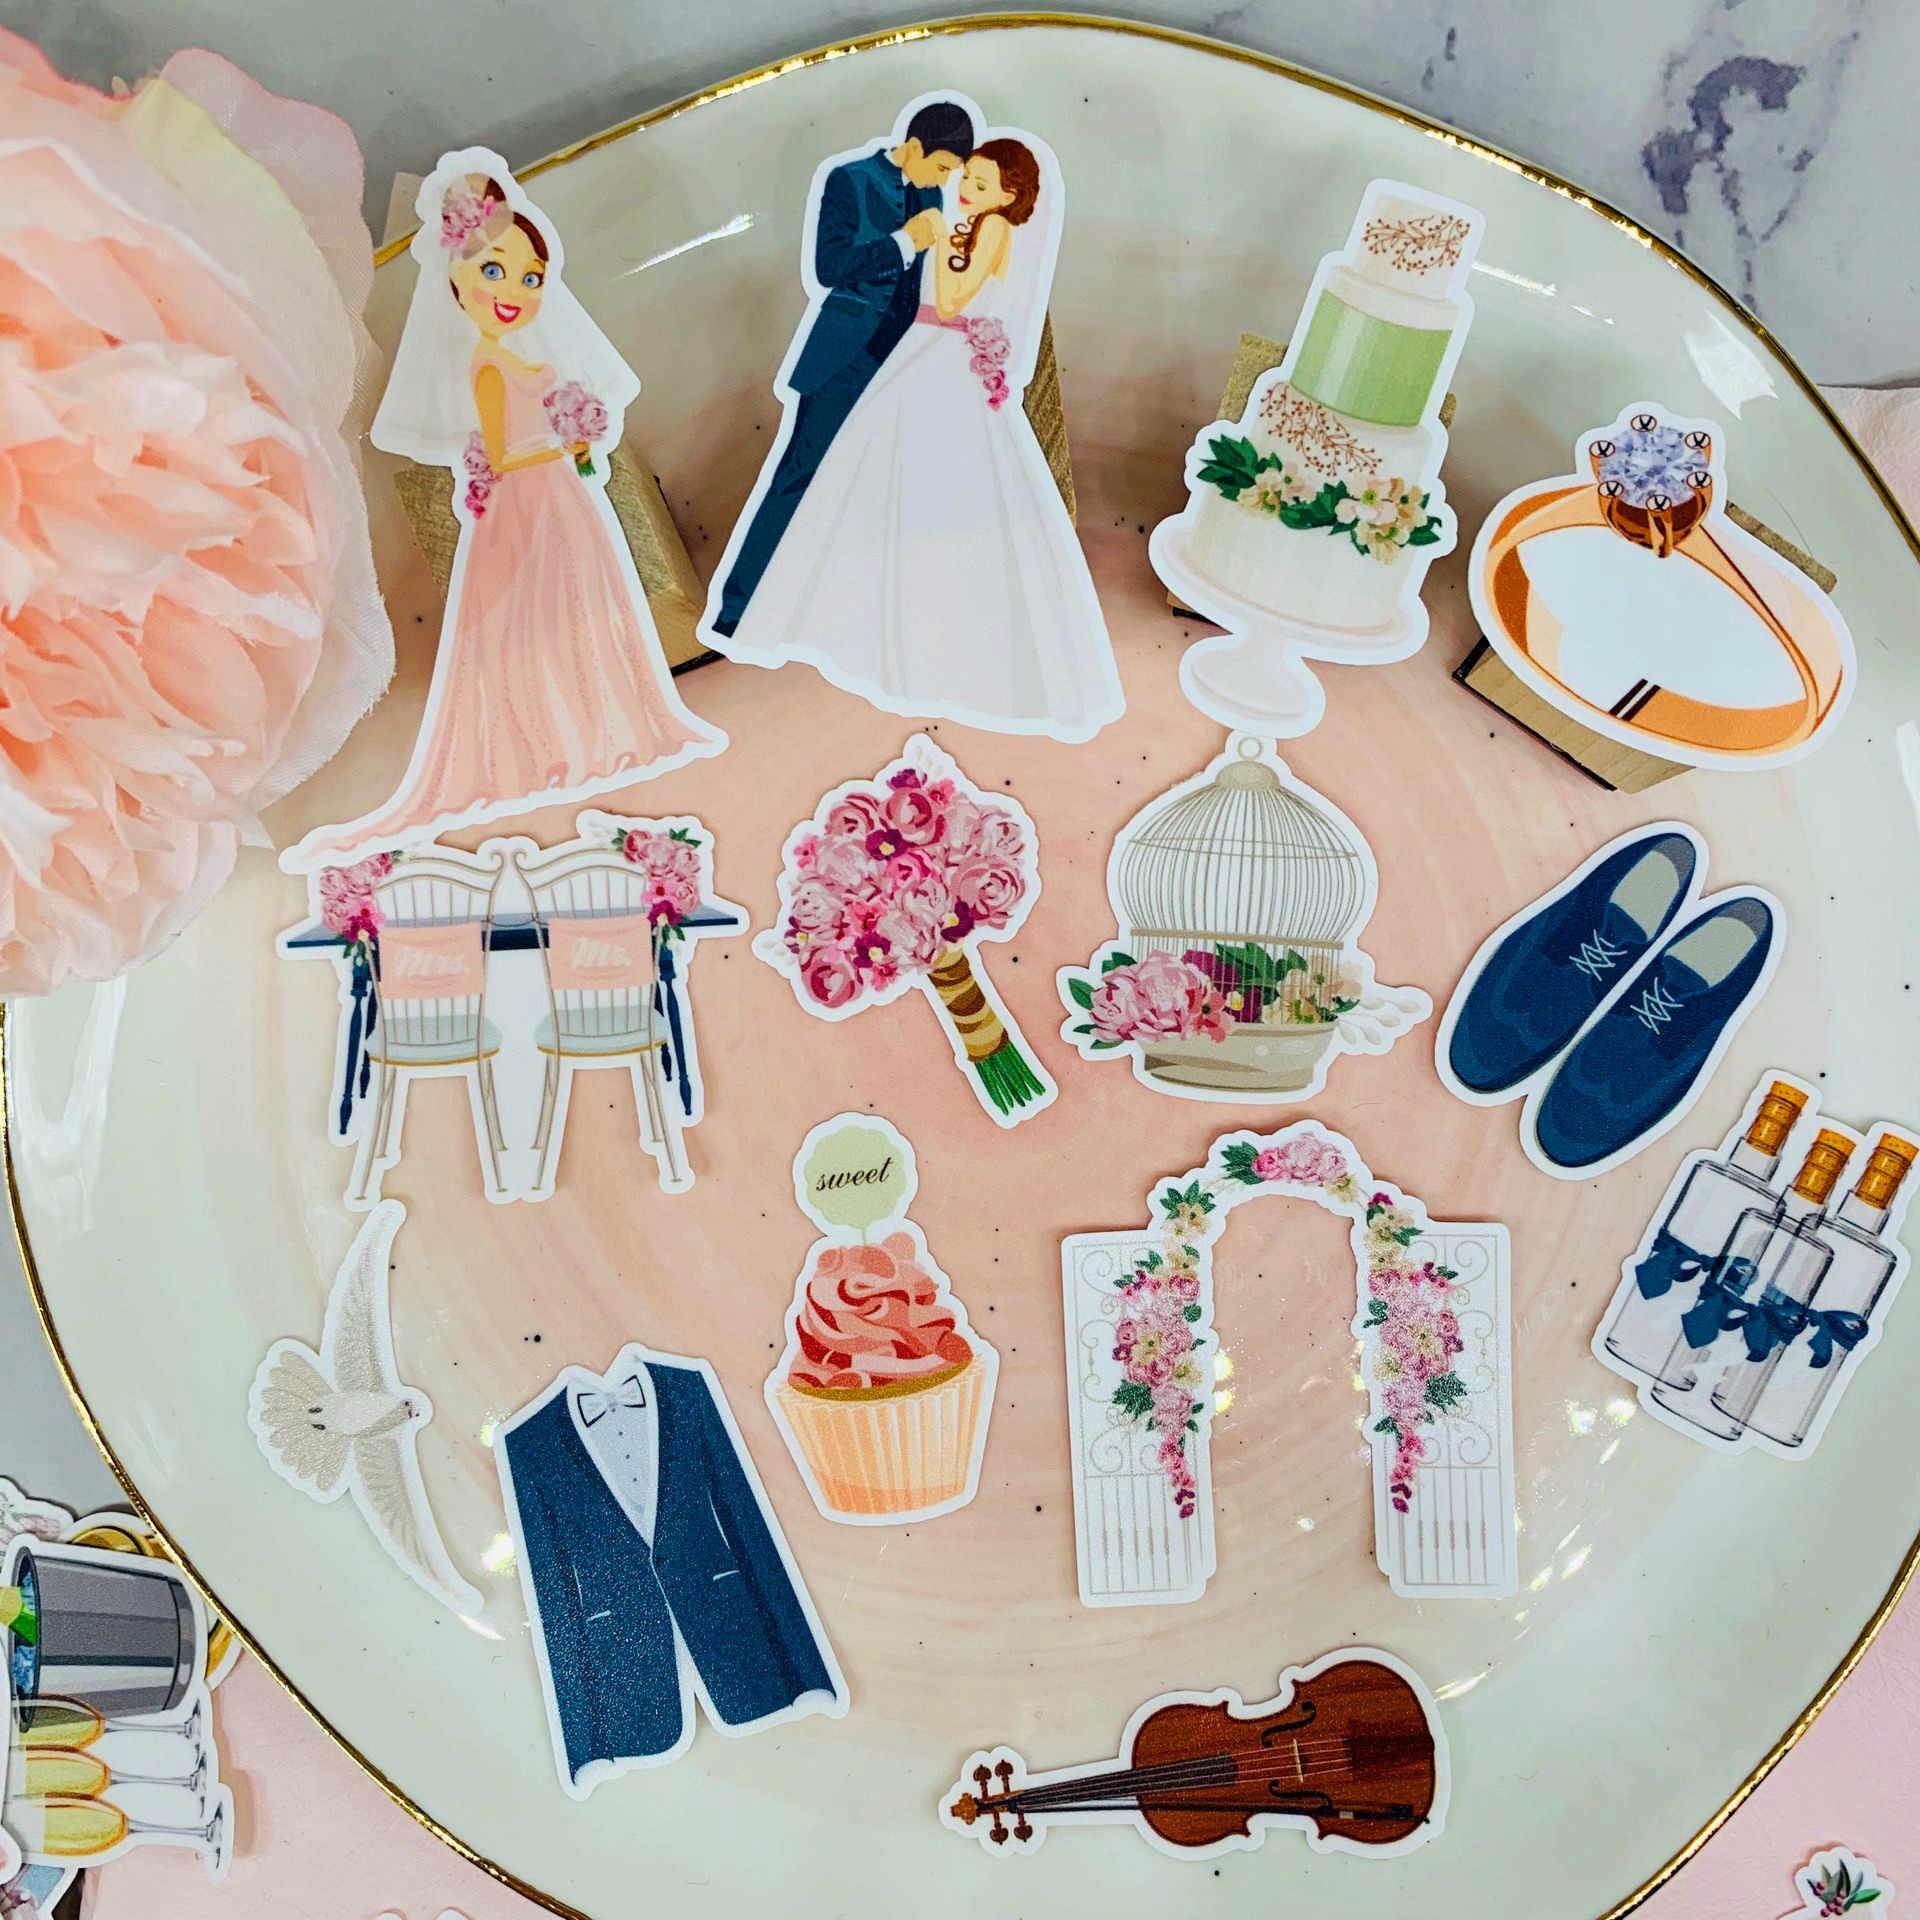 28 Pcs Lucu Pesta Pernikahan Pola Kertas Stiker untuk Anak-anak Buatan Sendiri Buku Stiker Pada Laptop/Dekoratif Scrapbooking/DIY